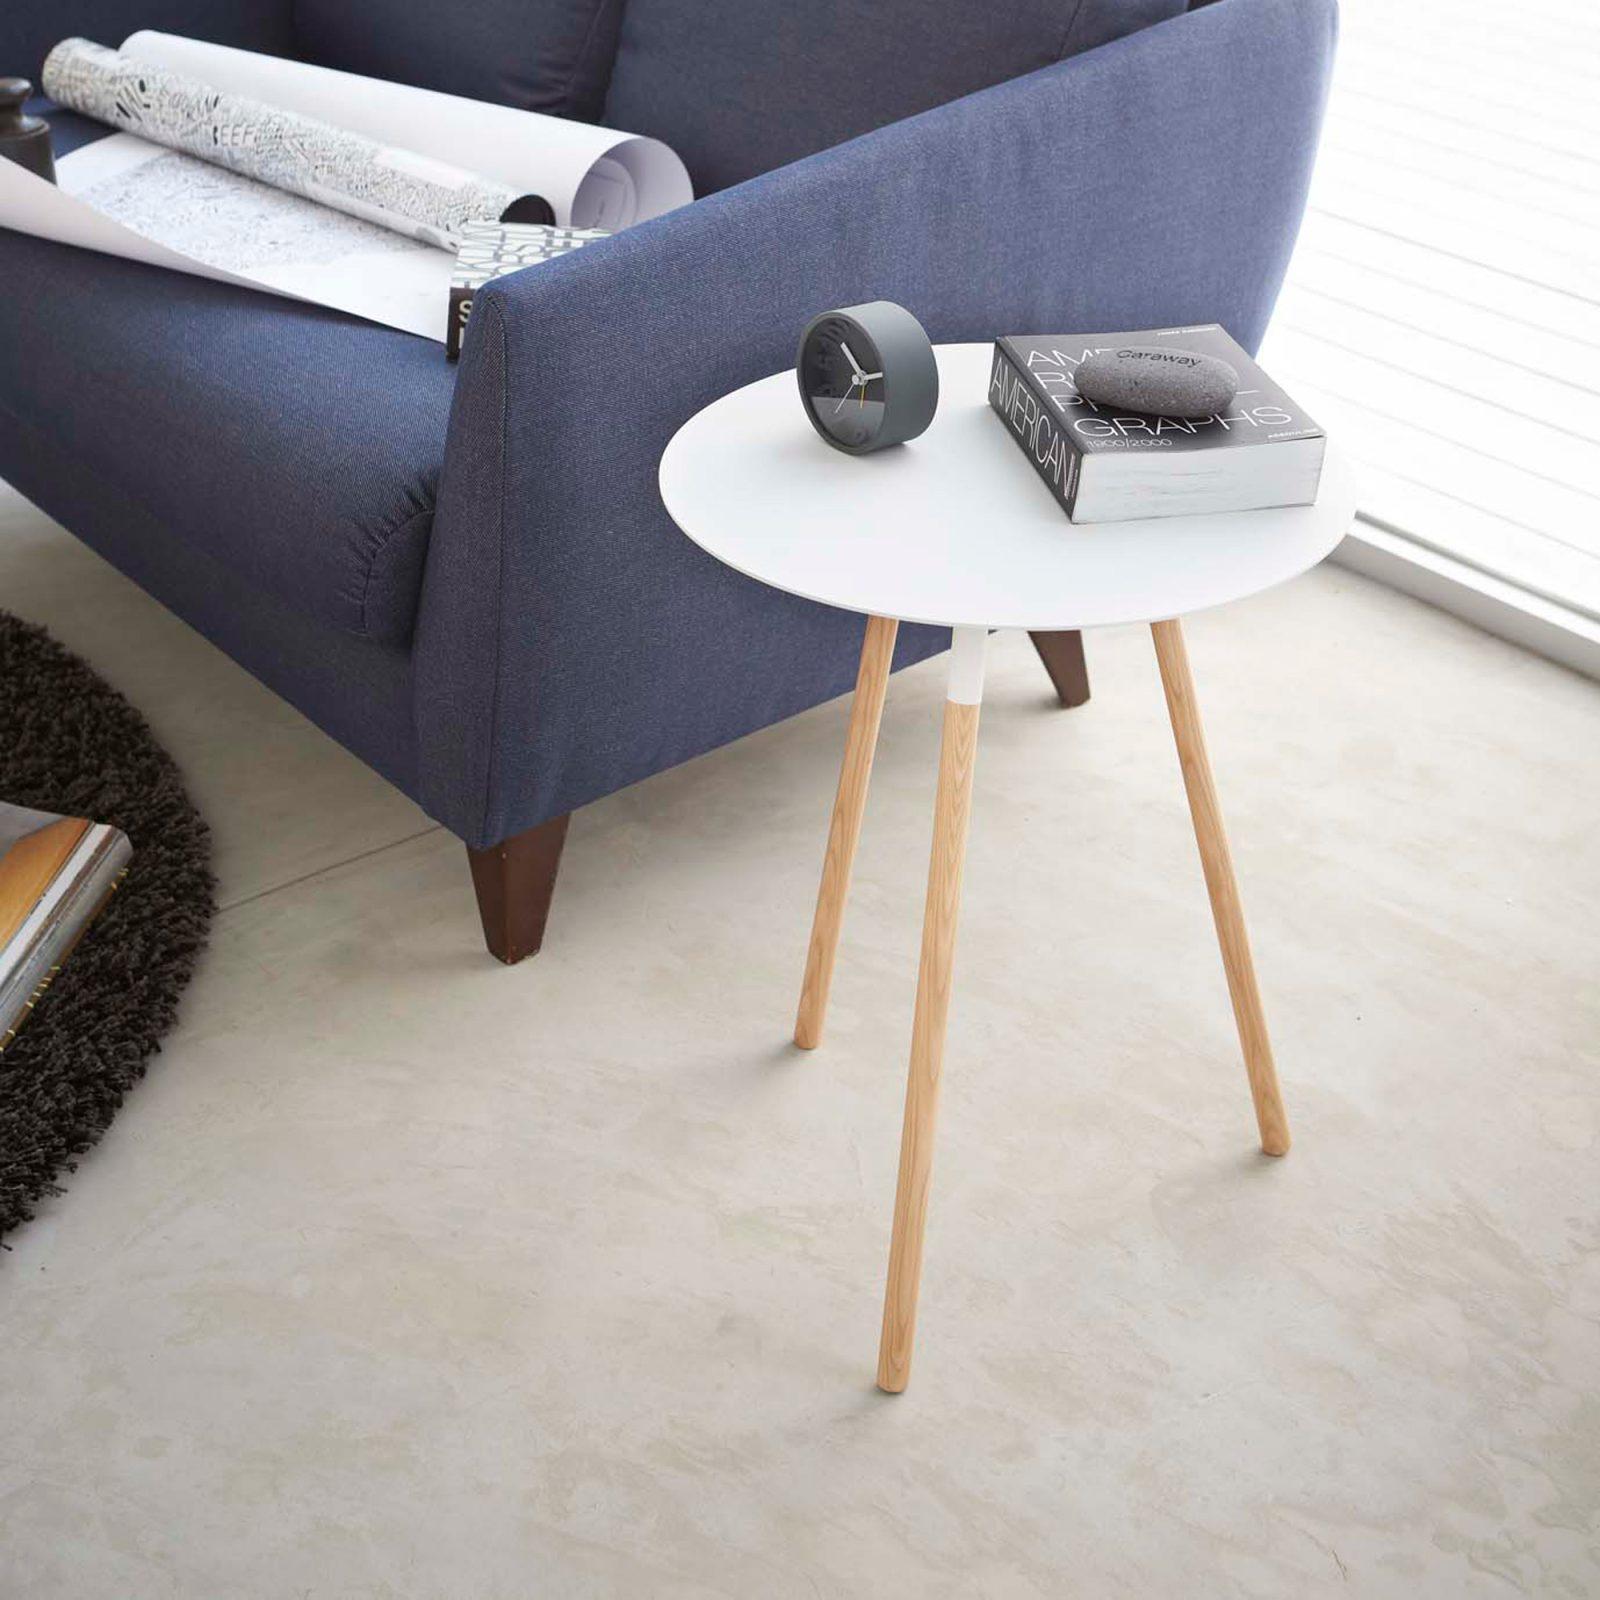 plain-round-side-table-white-2